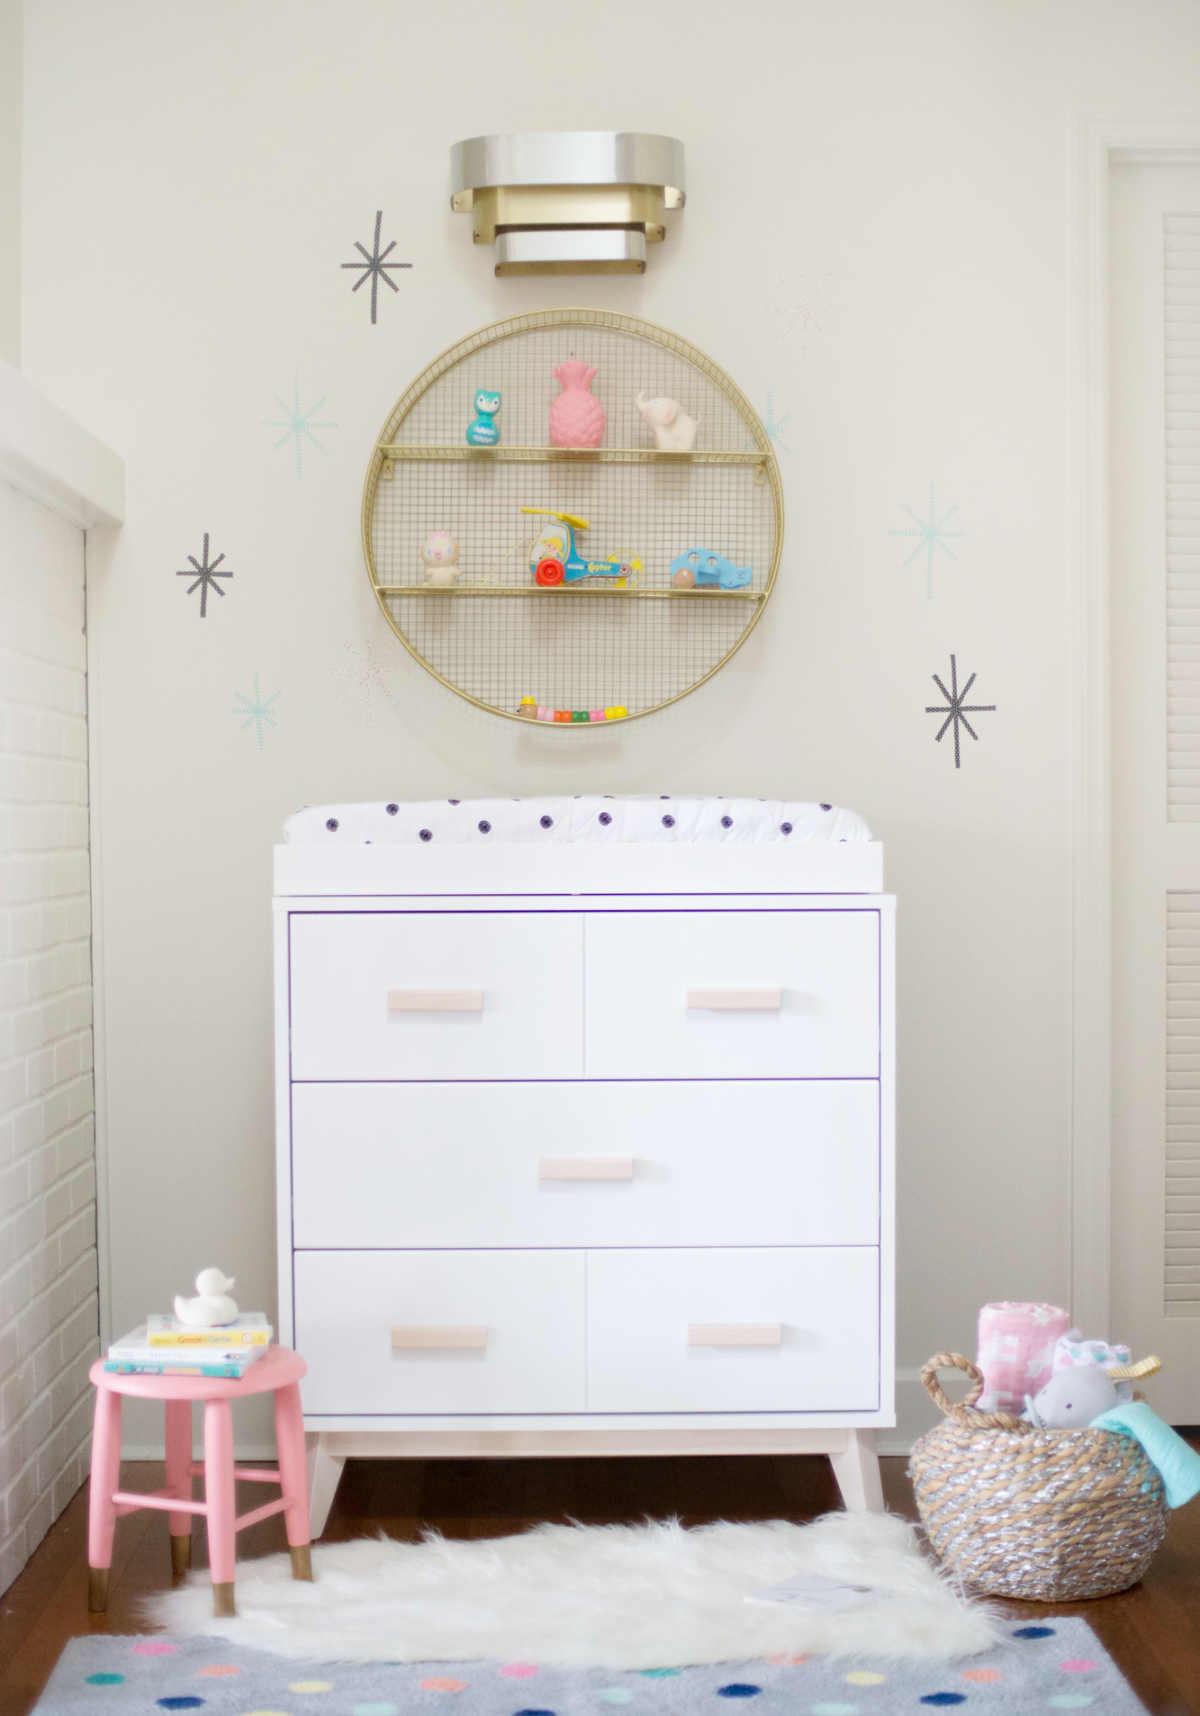 Small Space Nursery Ideas - Lay Baby Lay